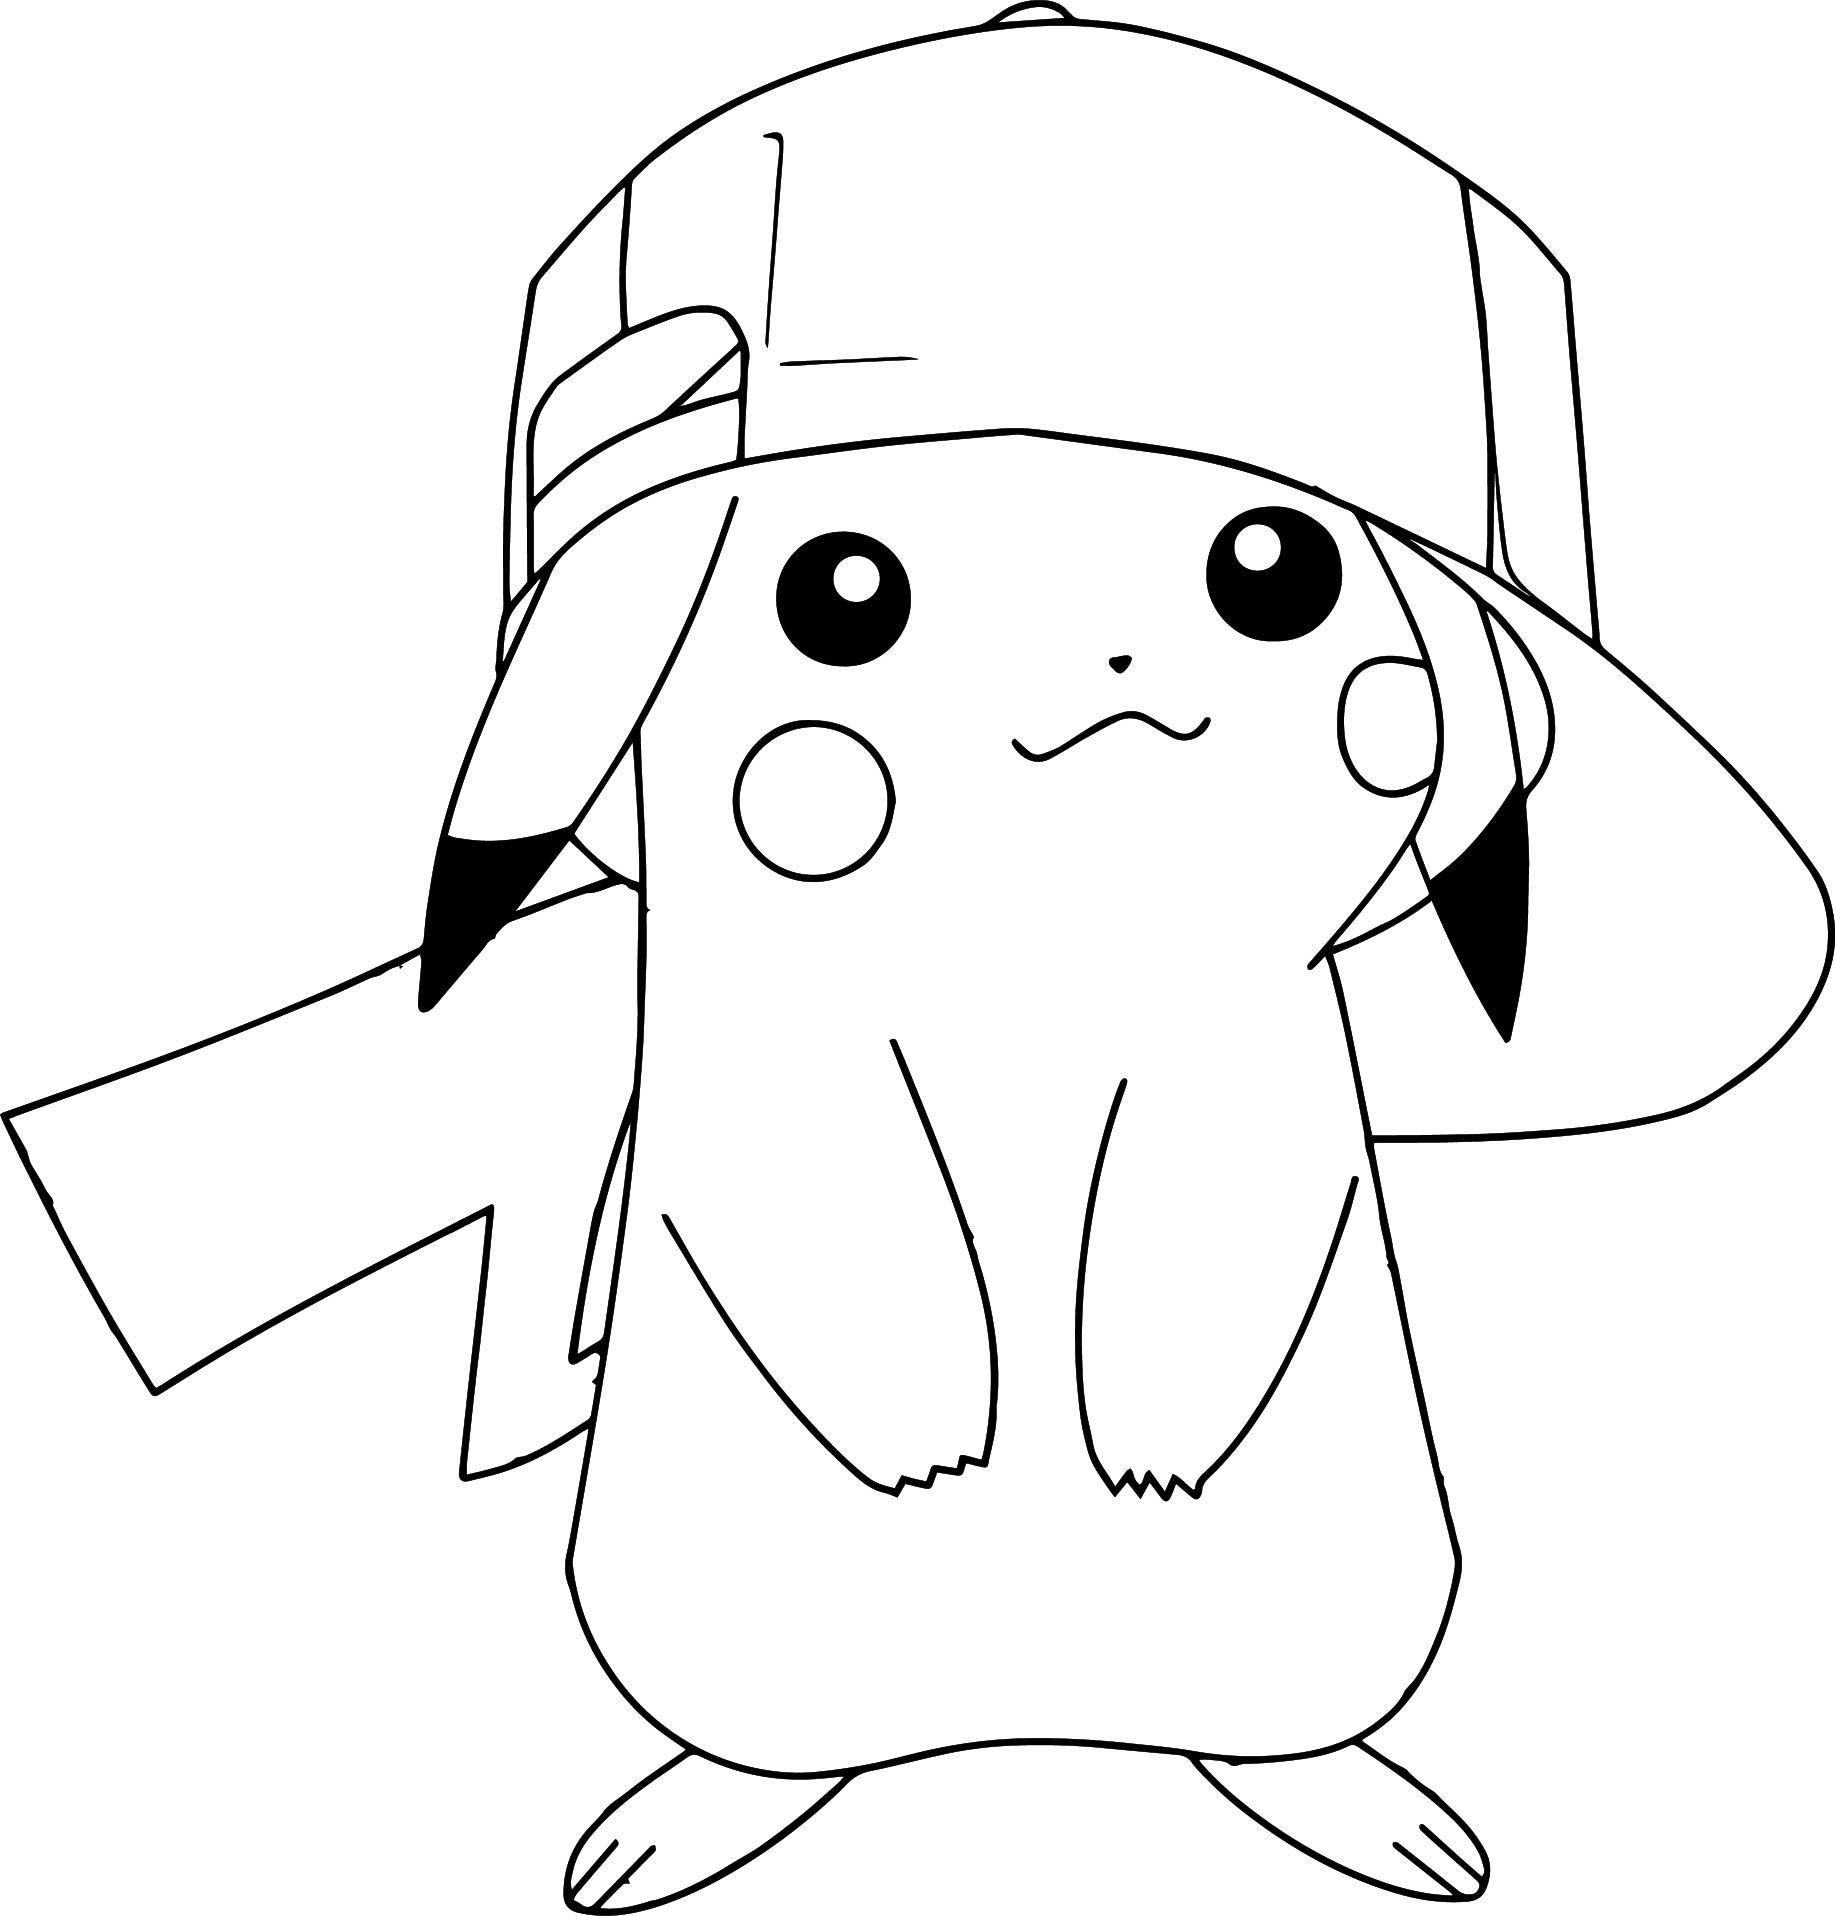 Pokemon Coloring Page Pikachu Pikachu Coloring Page Cartoon